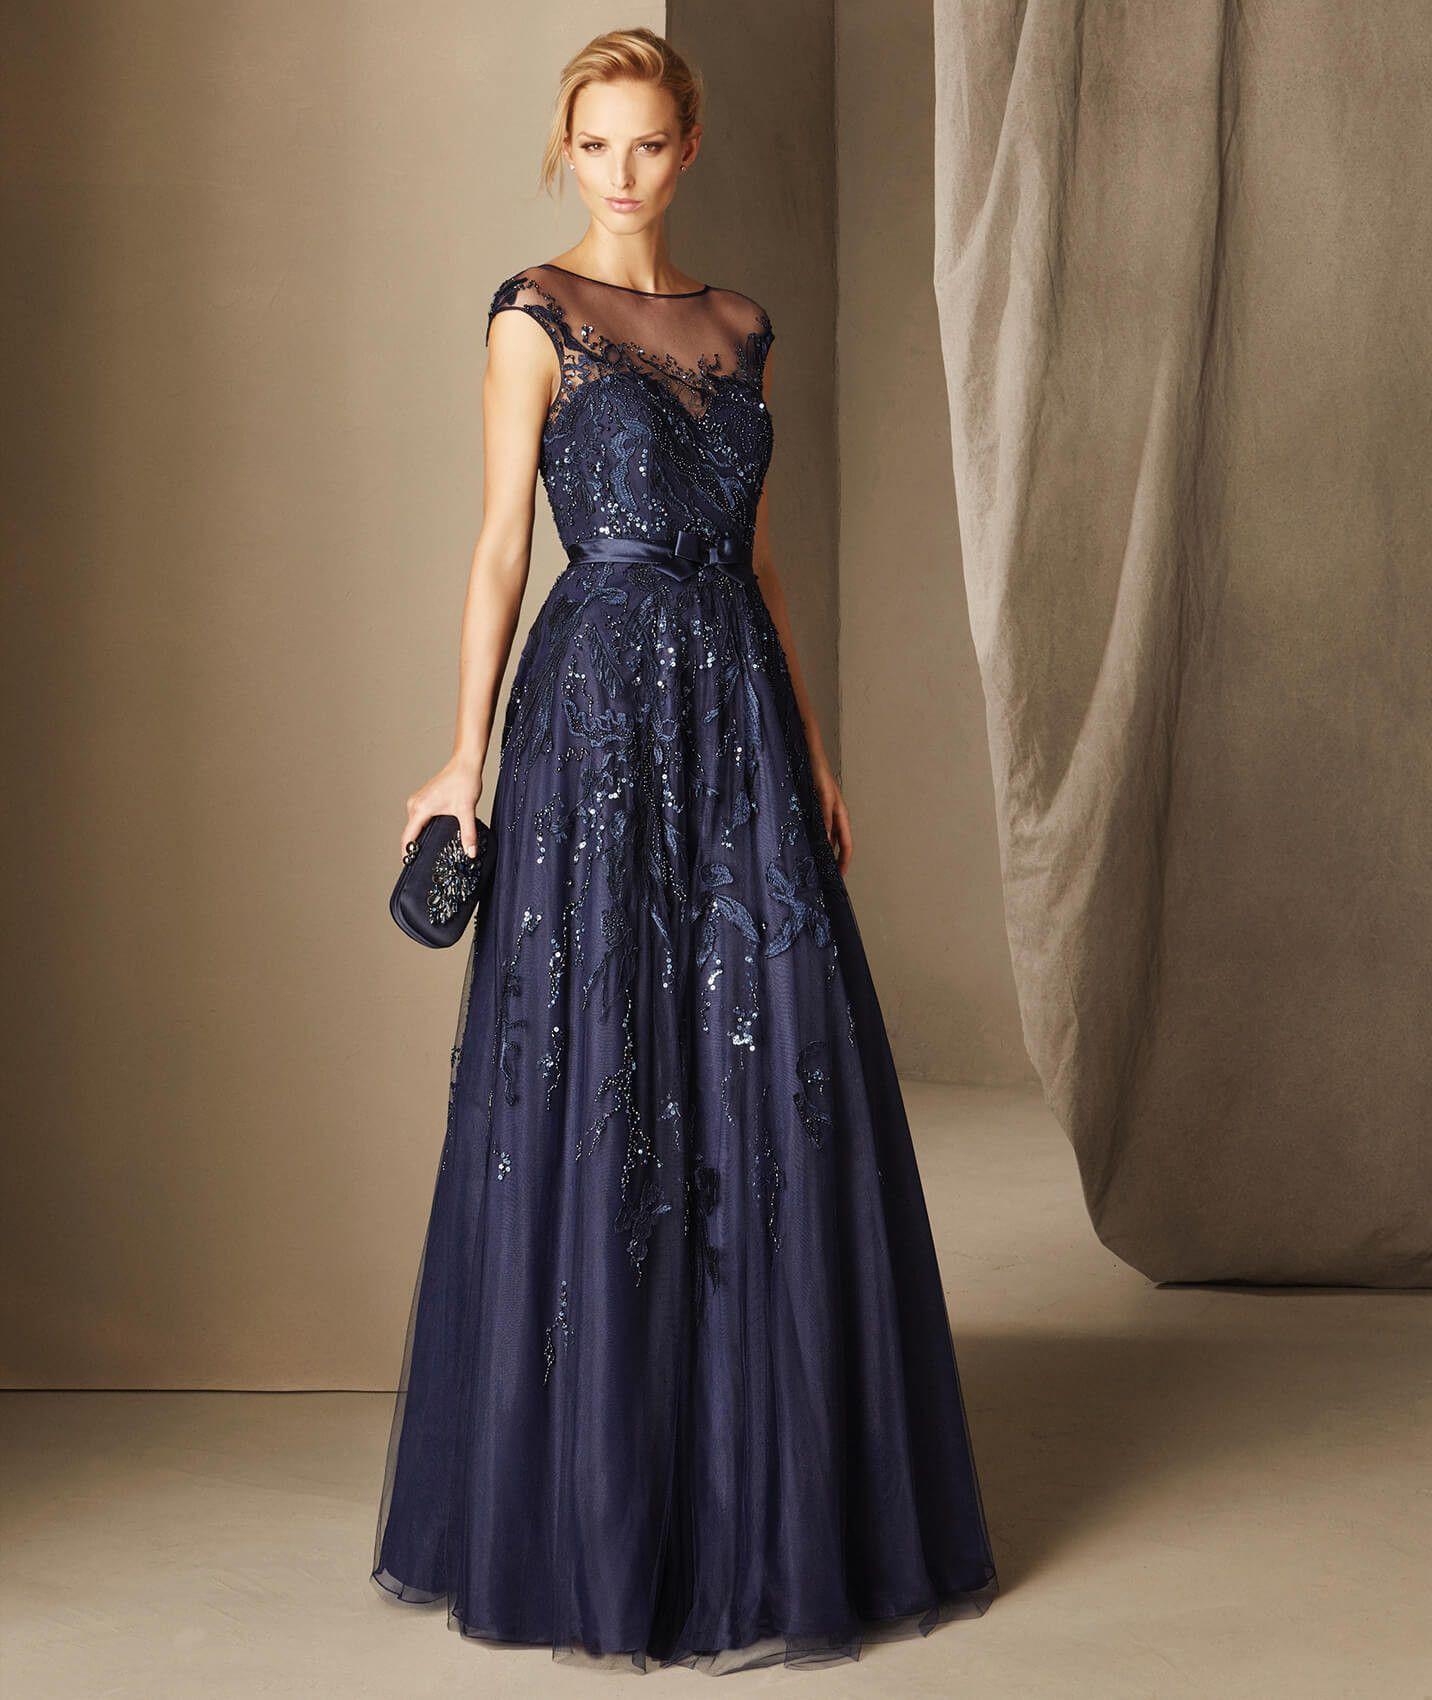 vestido festa pedraria tule nunca usado tam 36